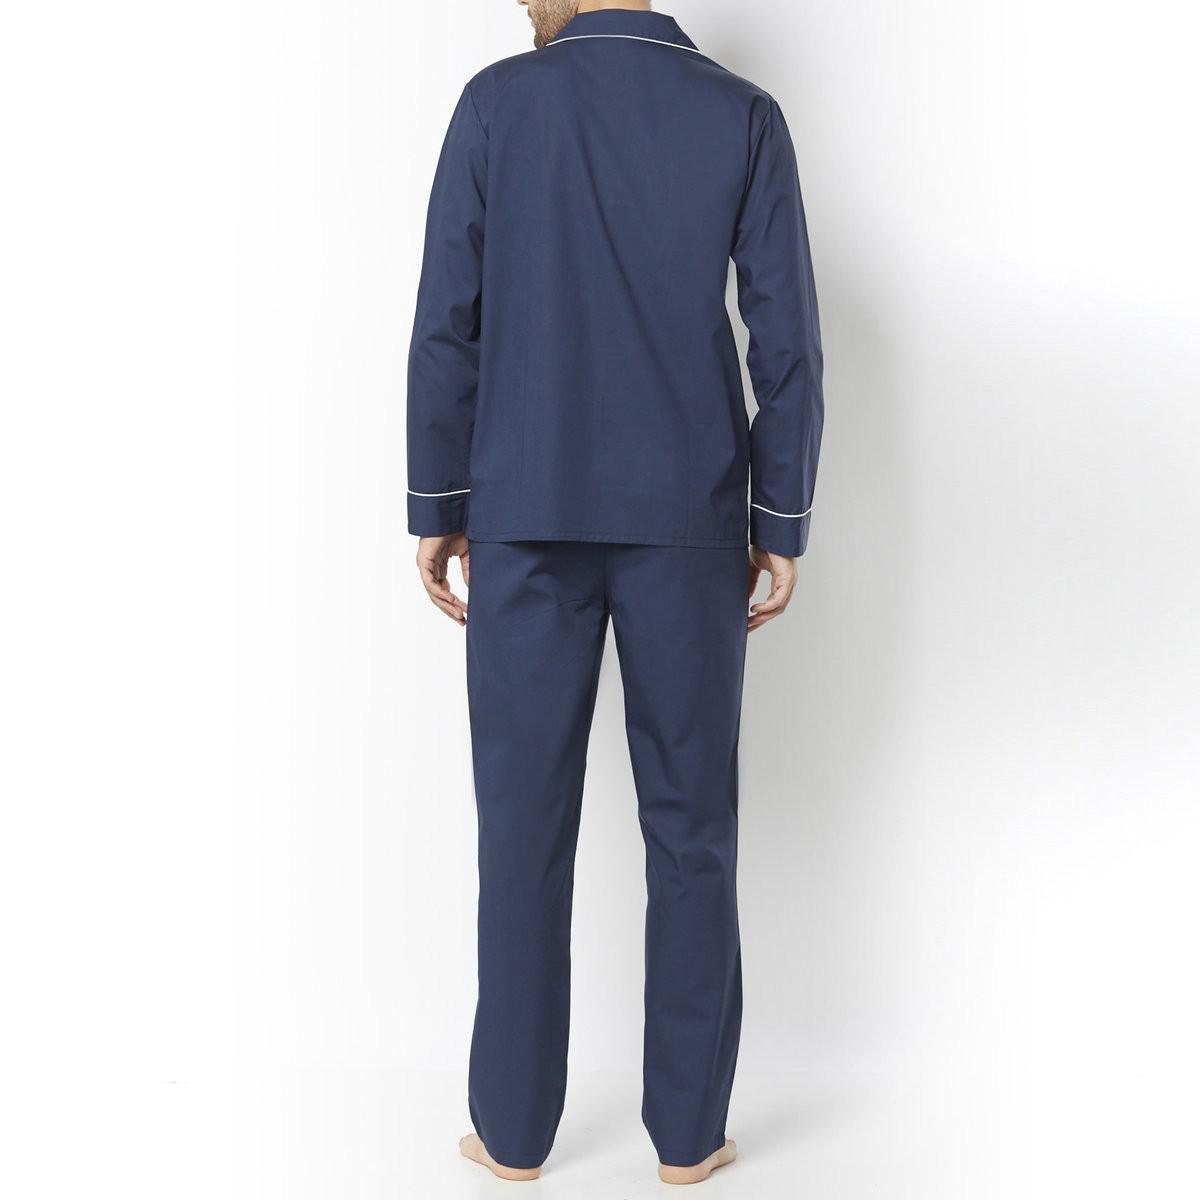 Veste de tailleur en coton